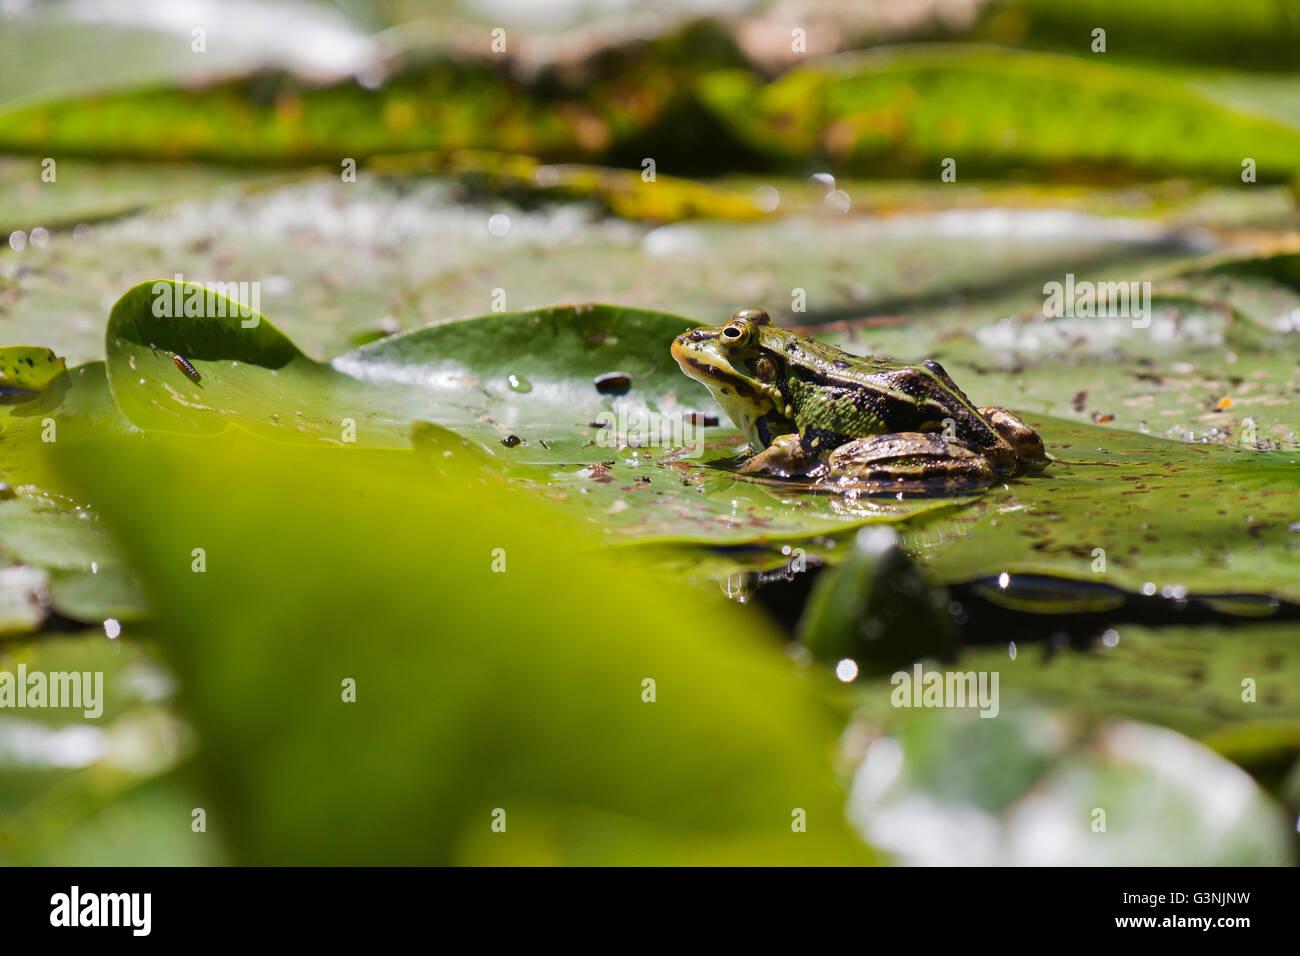 Green frog (Pelophylax esculentus), Schrems upland moor nature park, Waldviertel, Forest Quarter, Lower Austria, Stock Photo